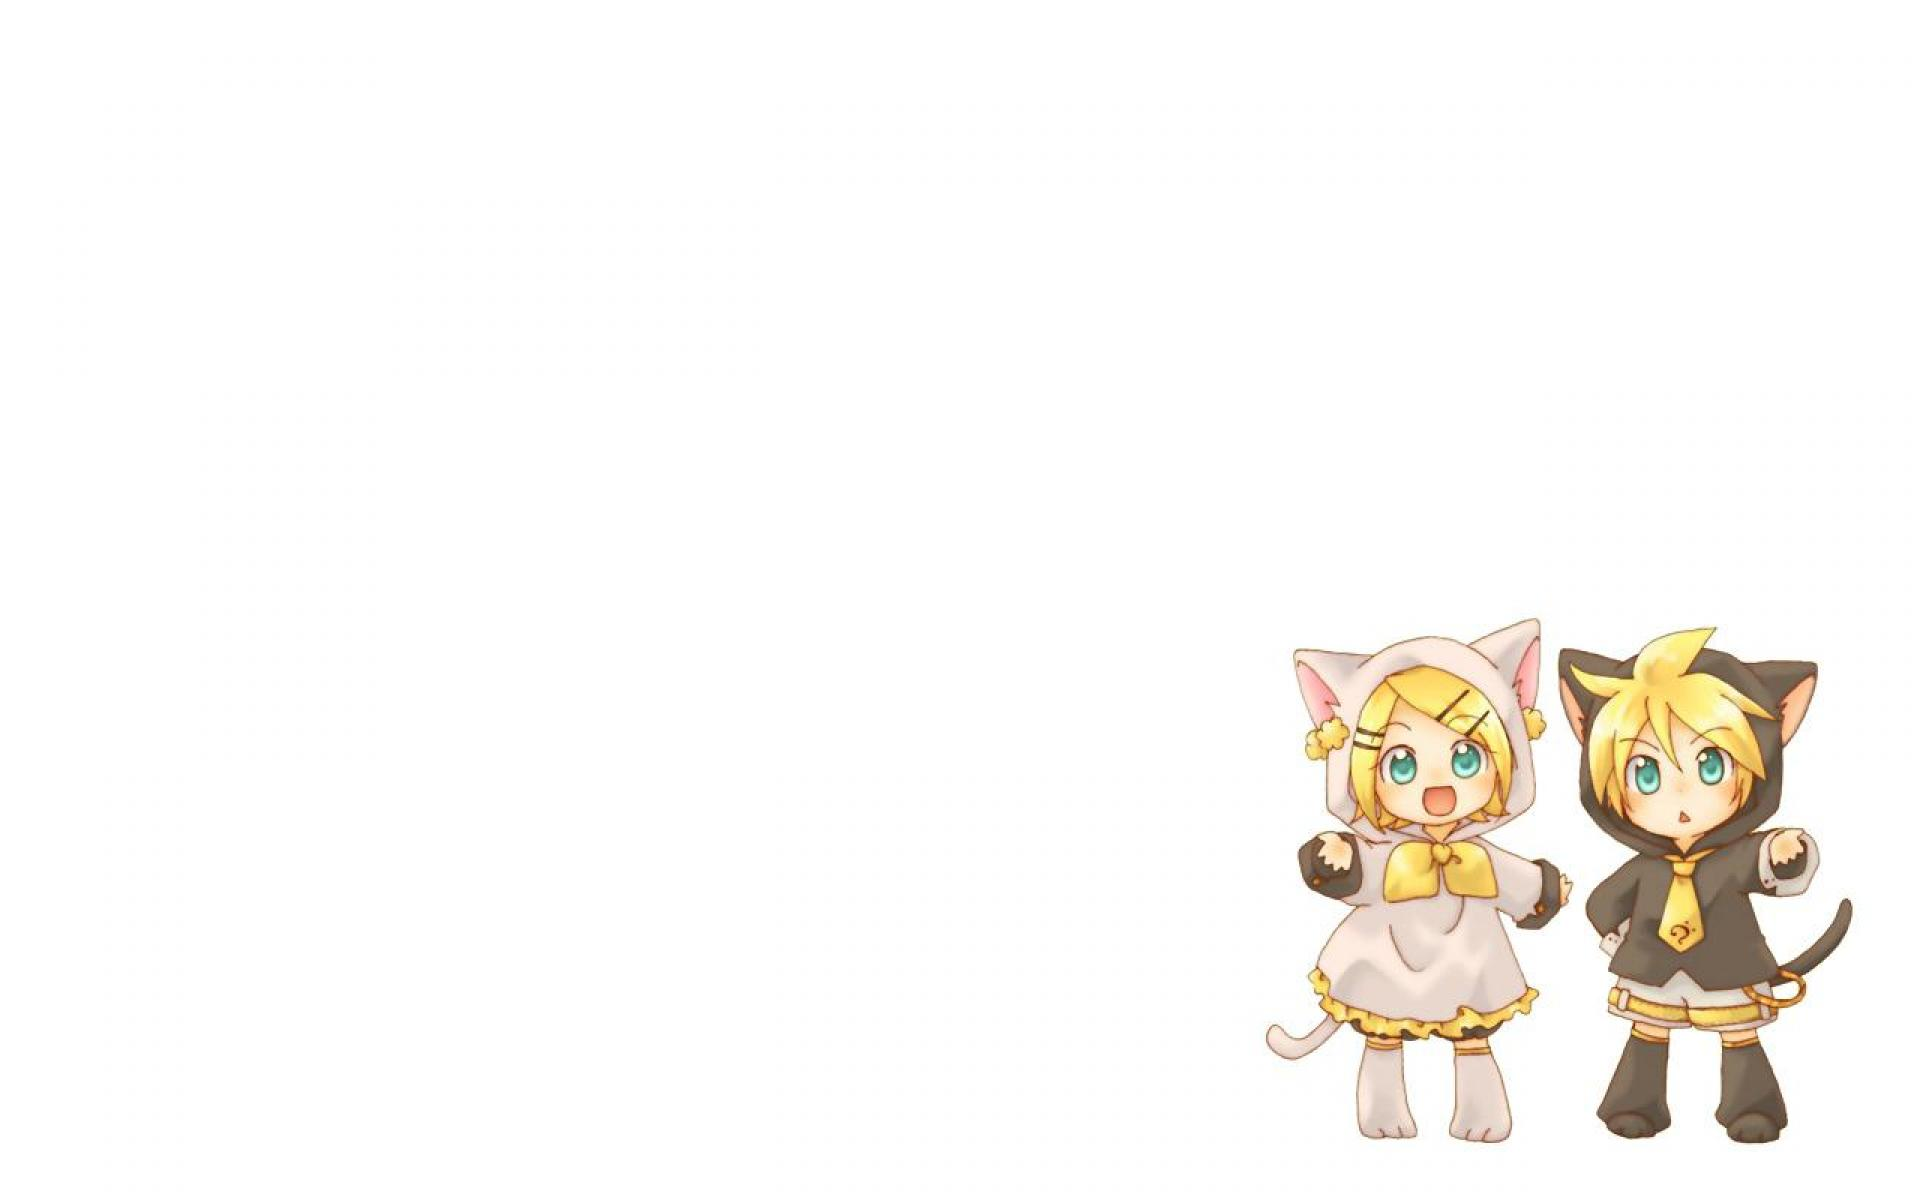 Naruto Hd Wallpapers Widescreen Chibi Wallpaper For Desktop Pixelstalk Net